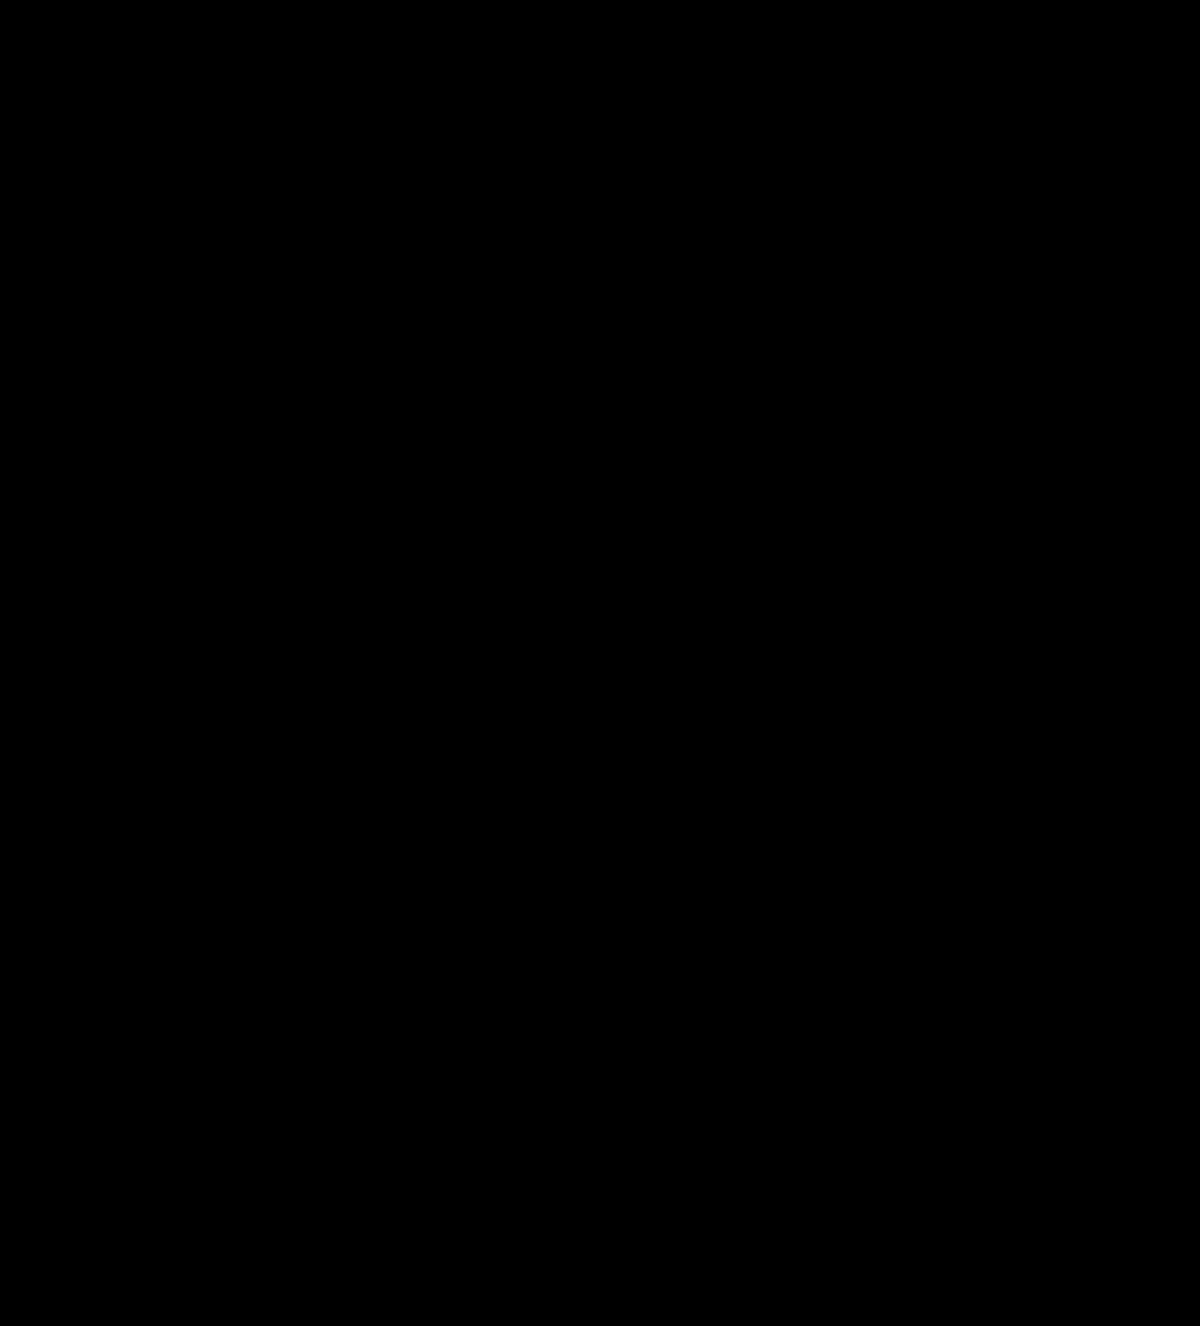 Logo-Hubbard In copy